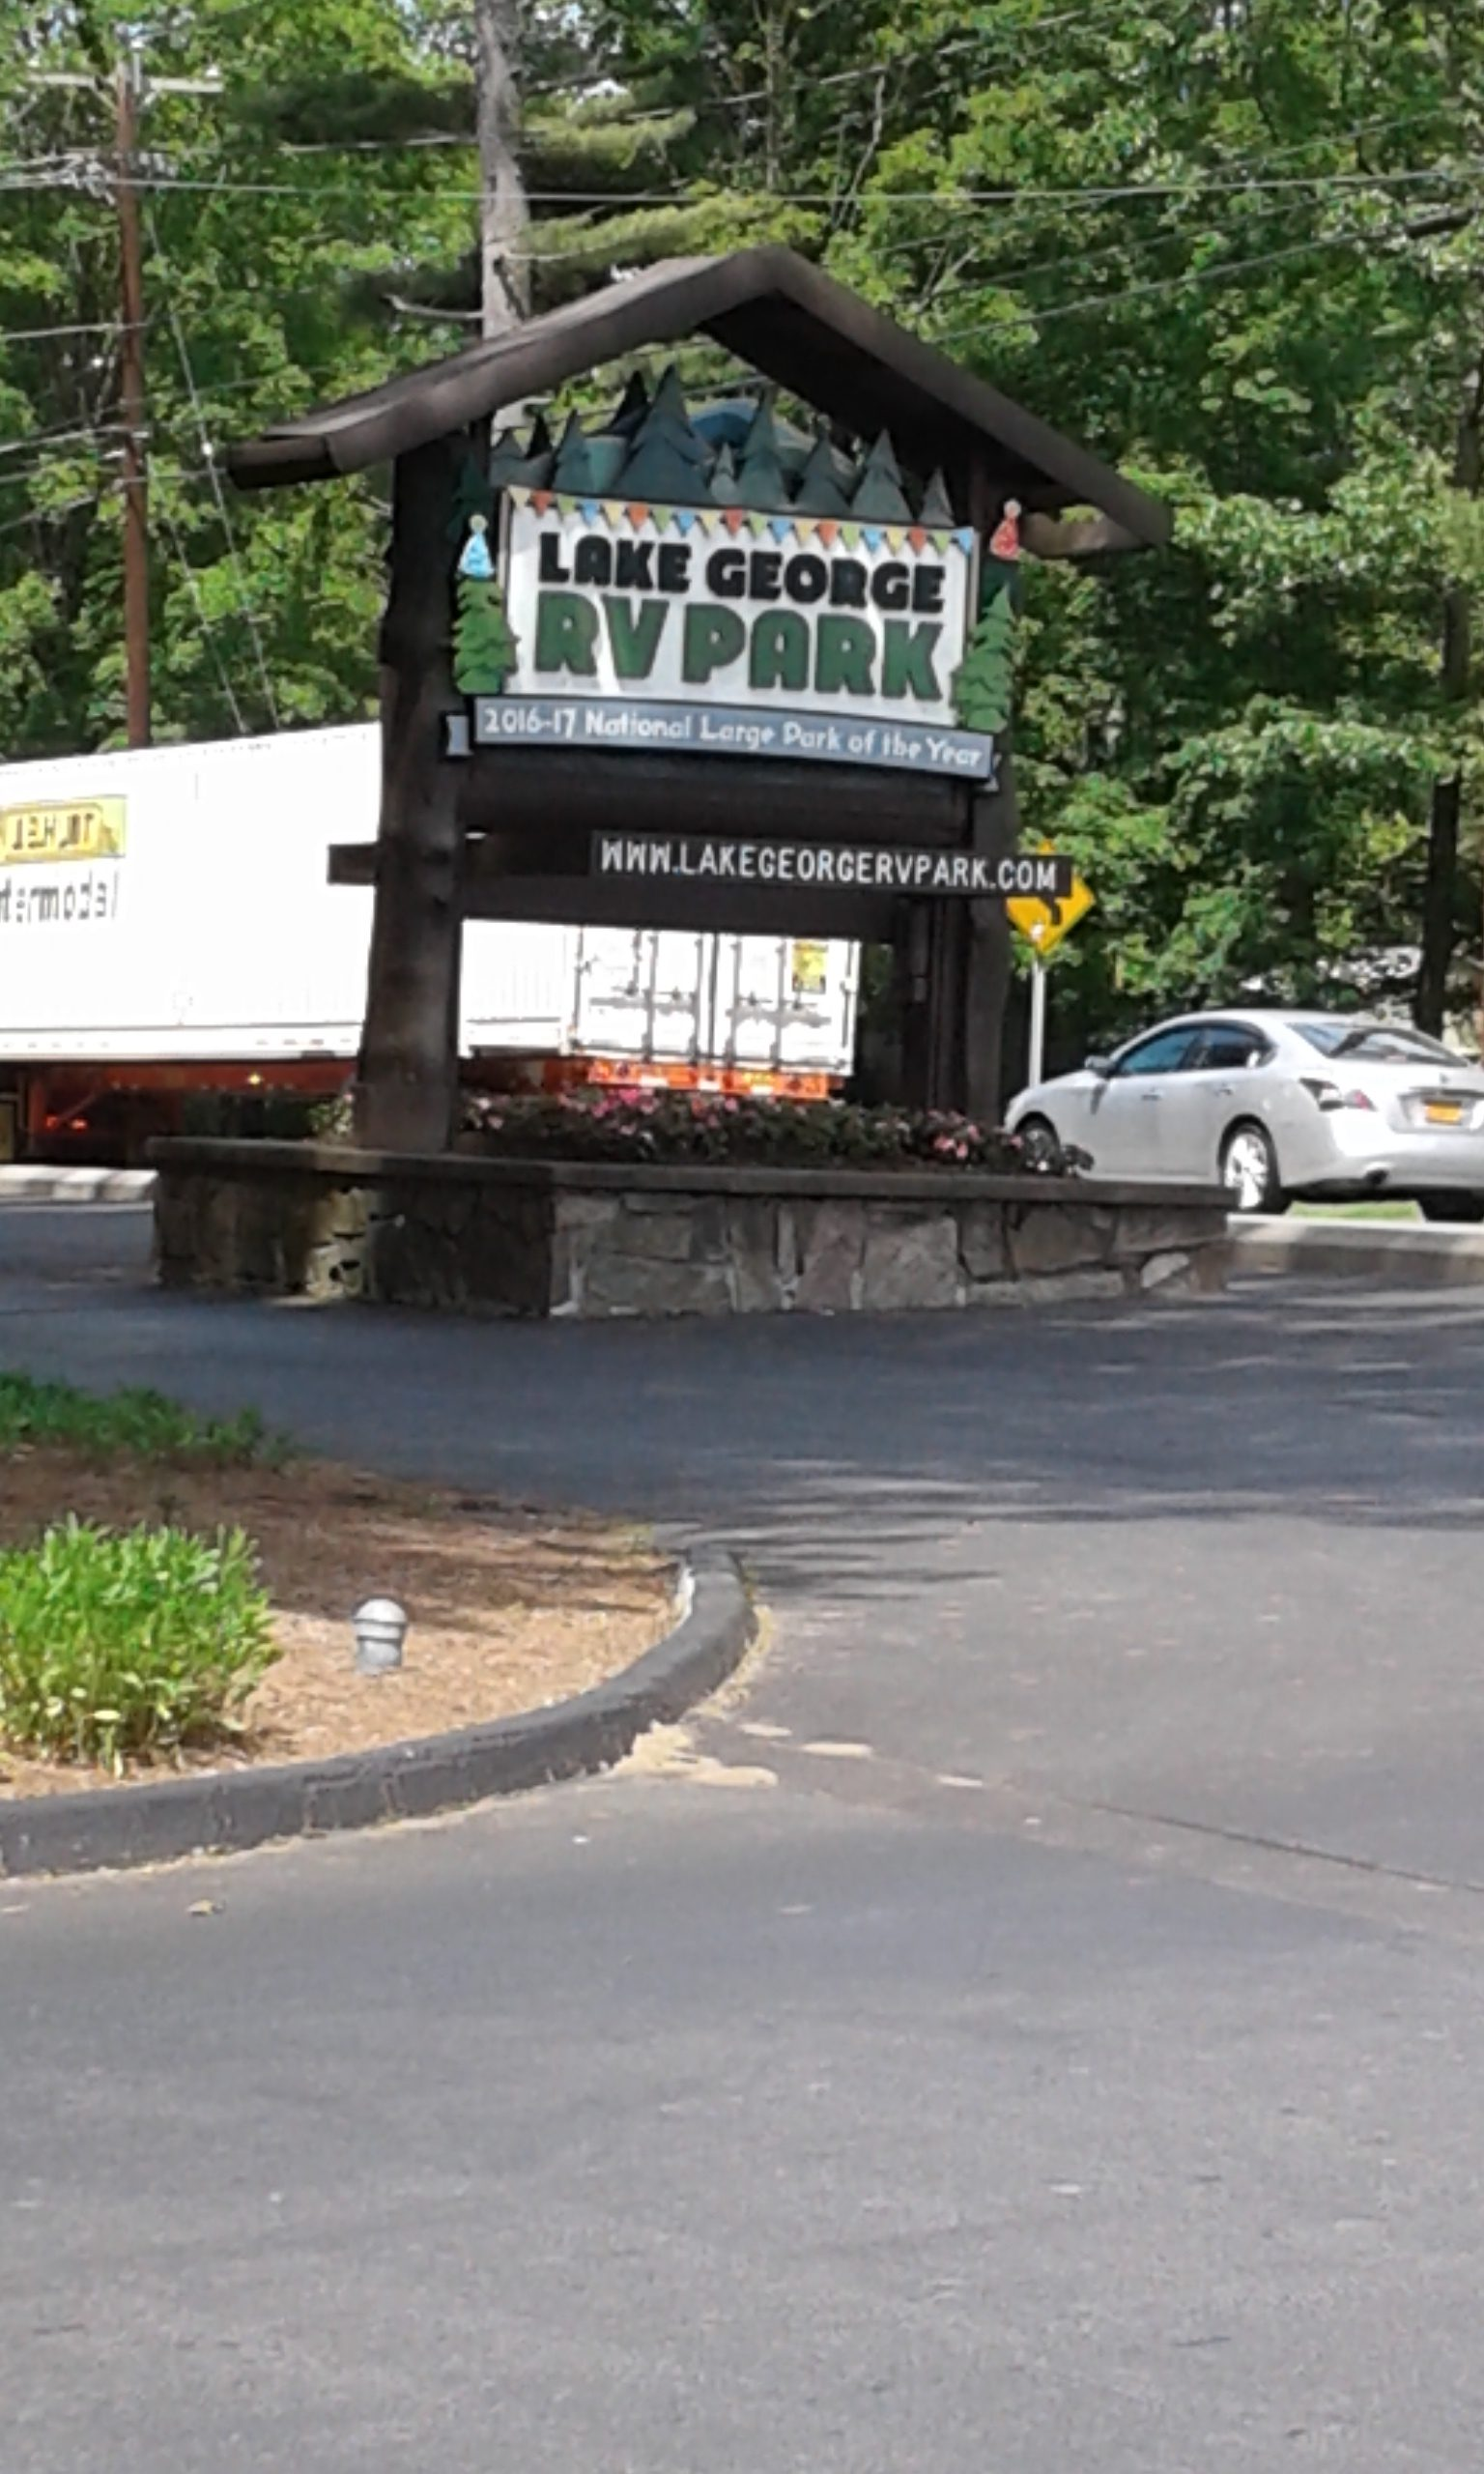 Lake George RV Park sign